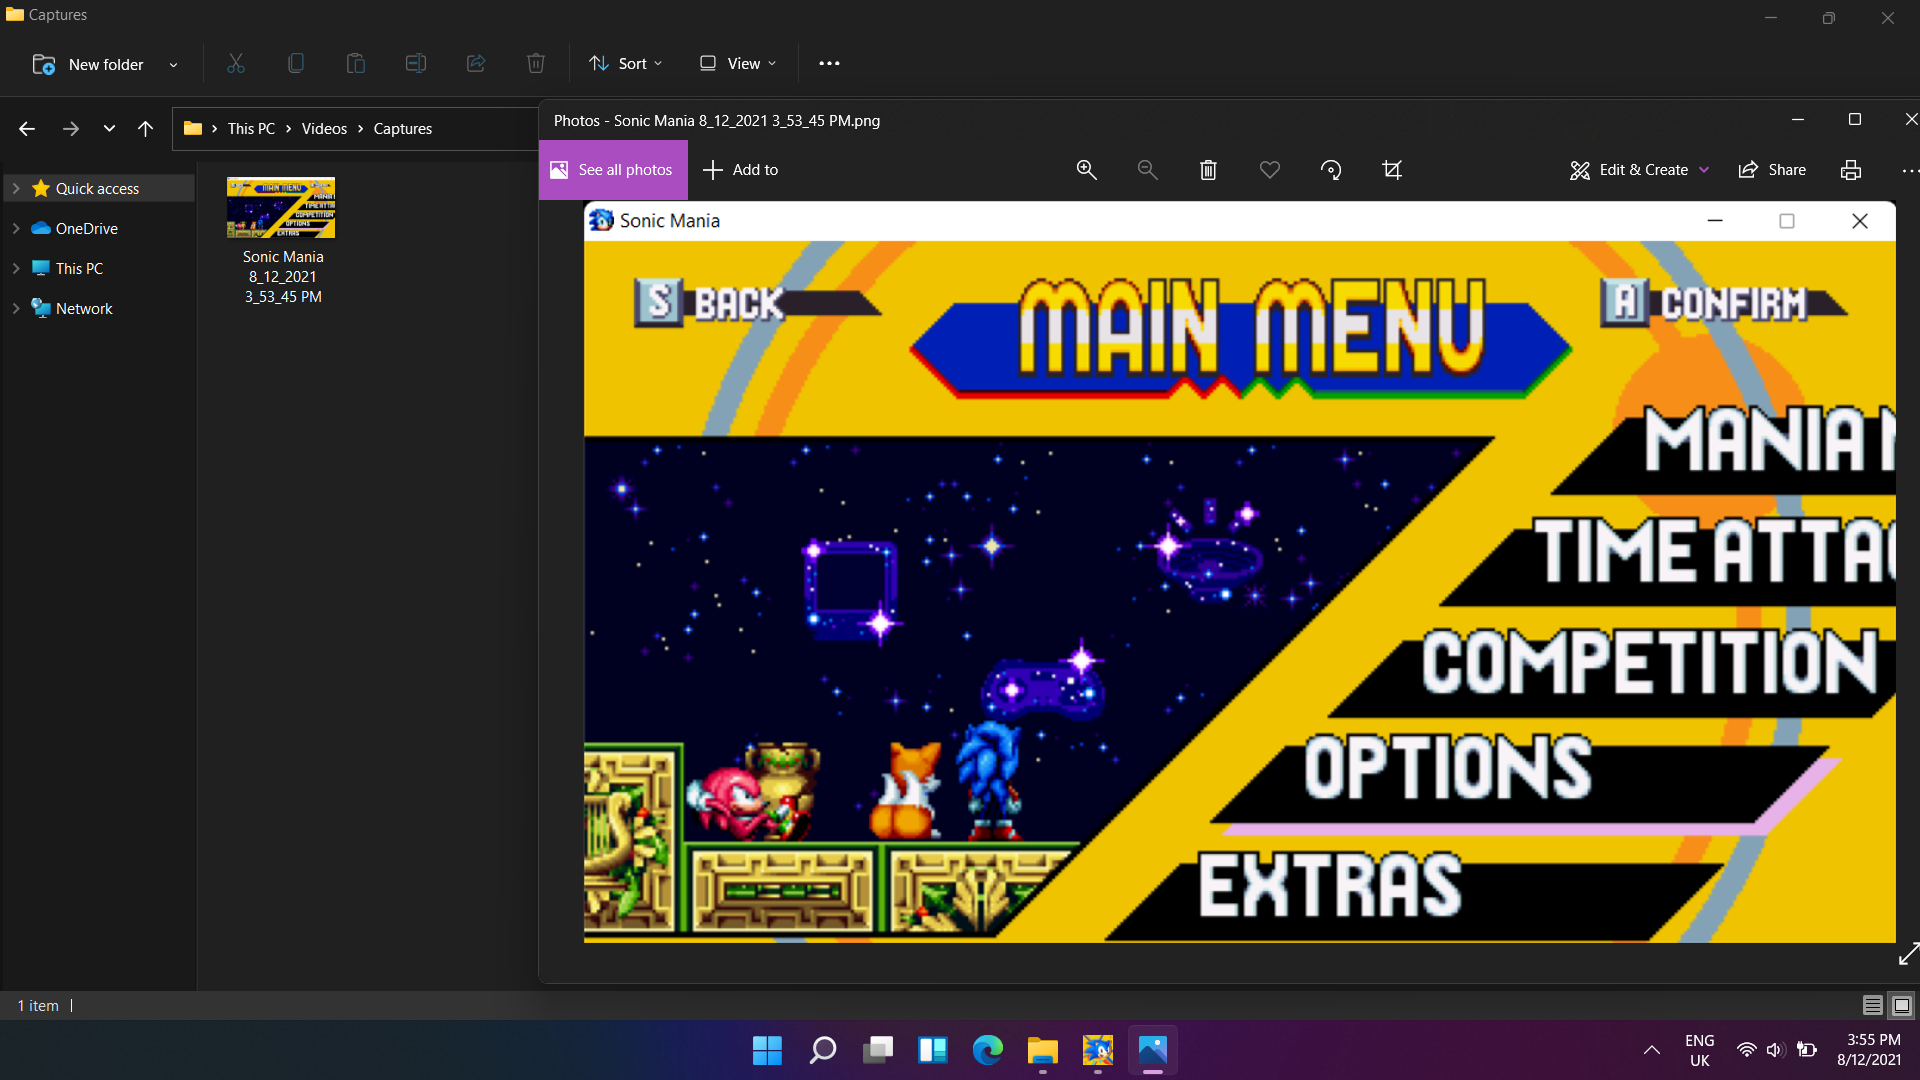 Sonic Mania screenshot in Windows 11